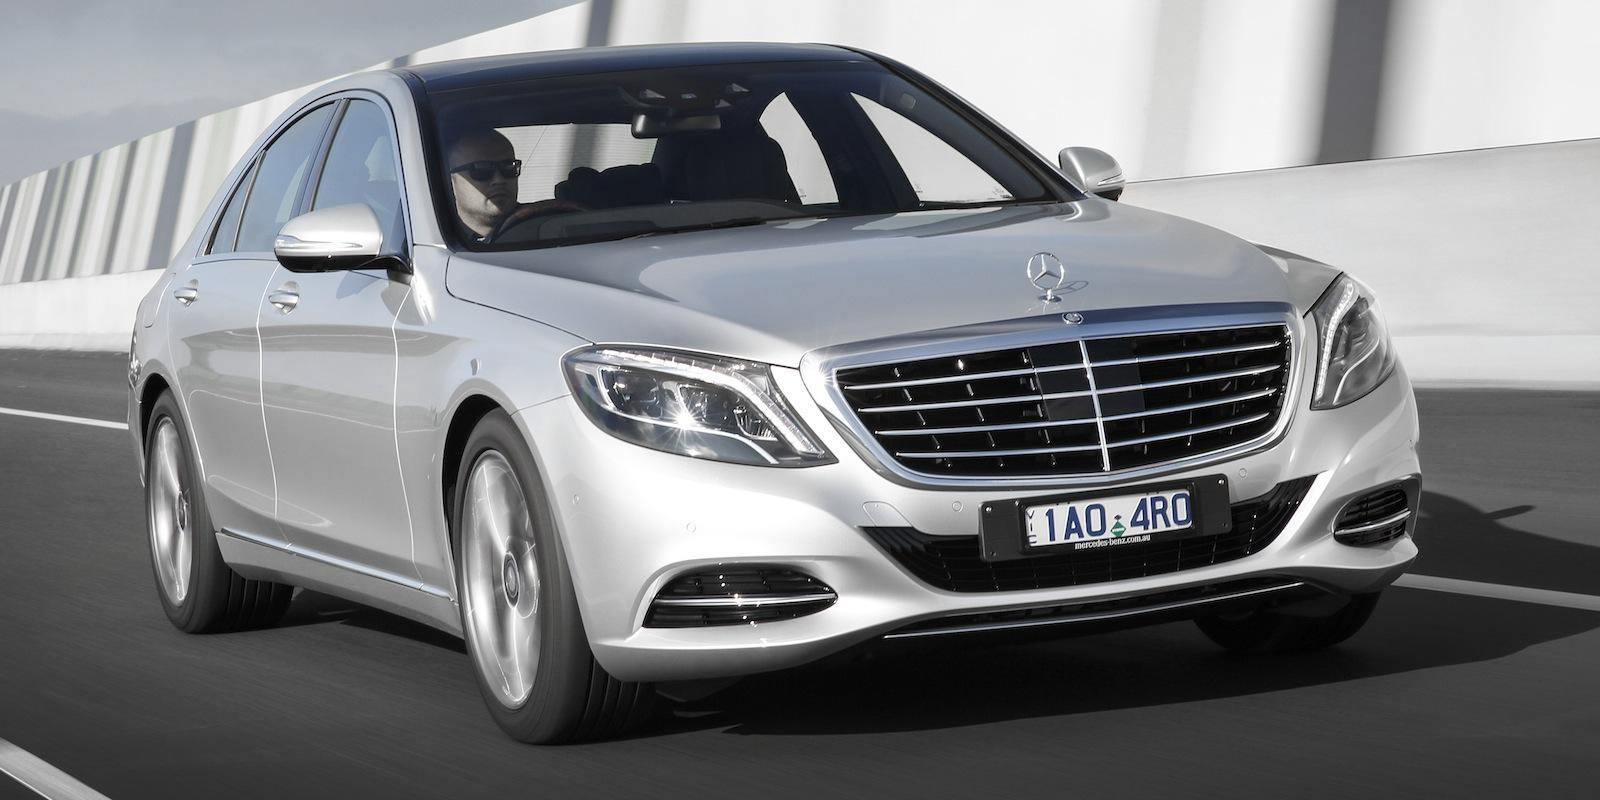 Australian Car Brands Split On Decision To Pass On Luxury